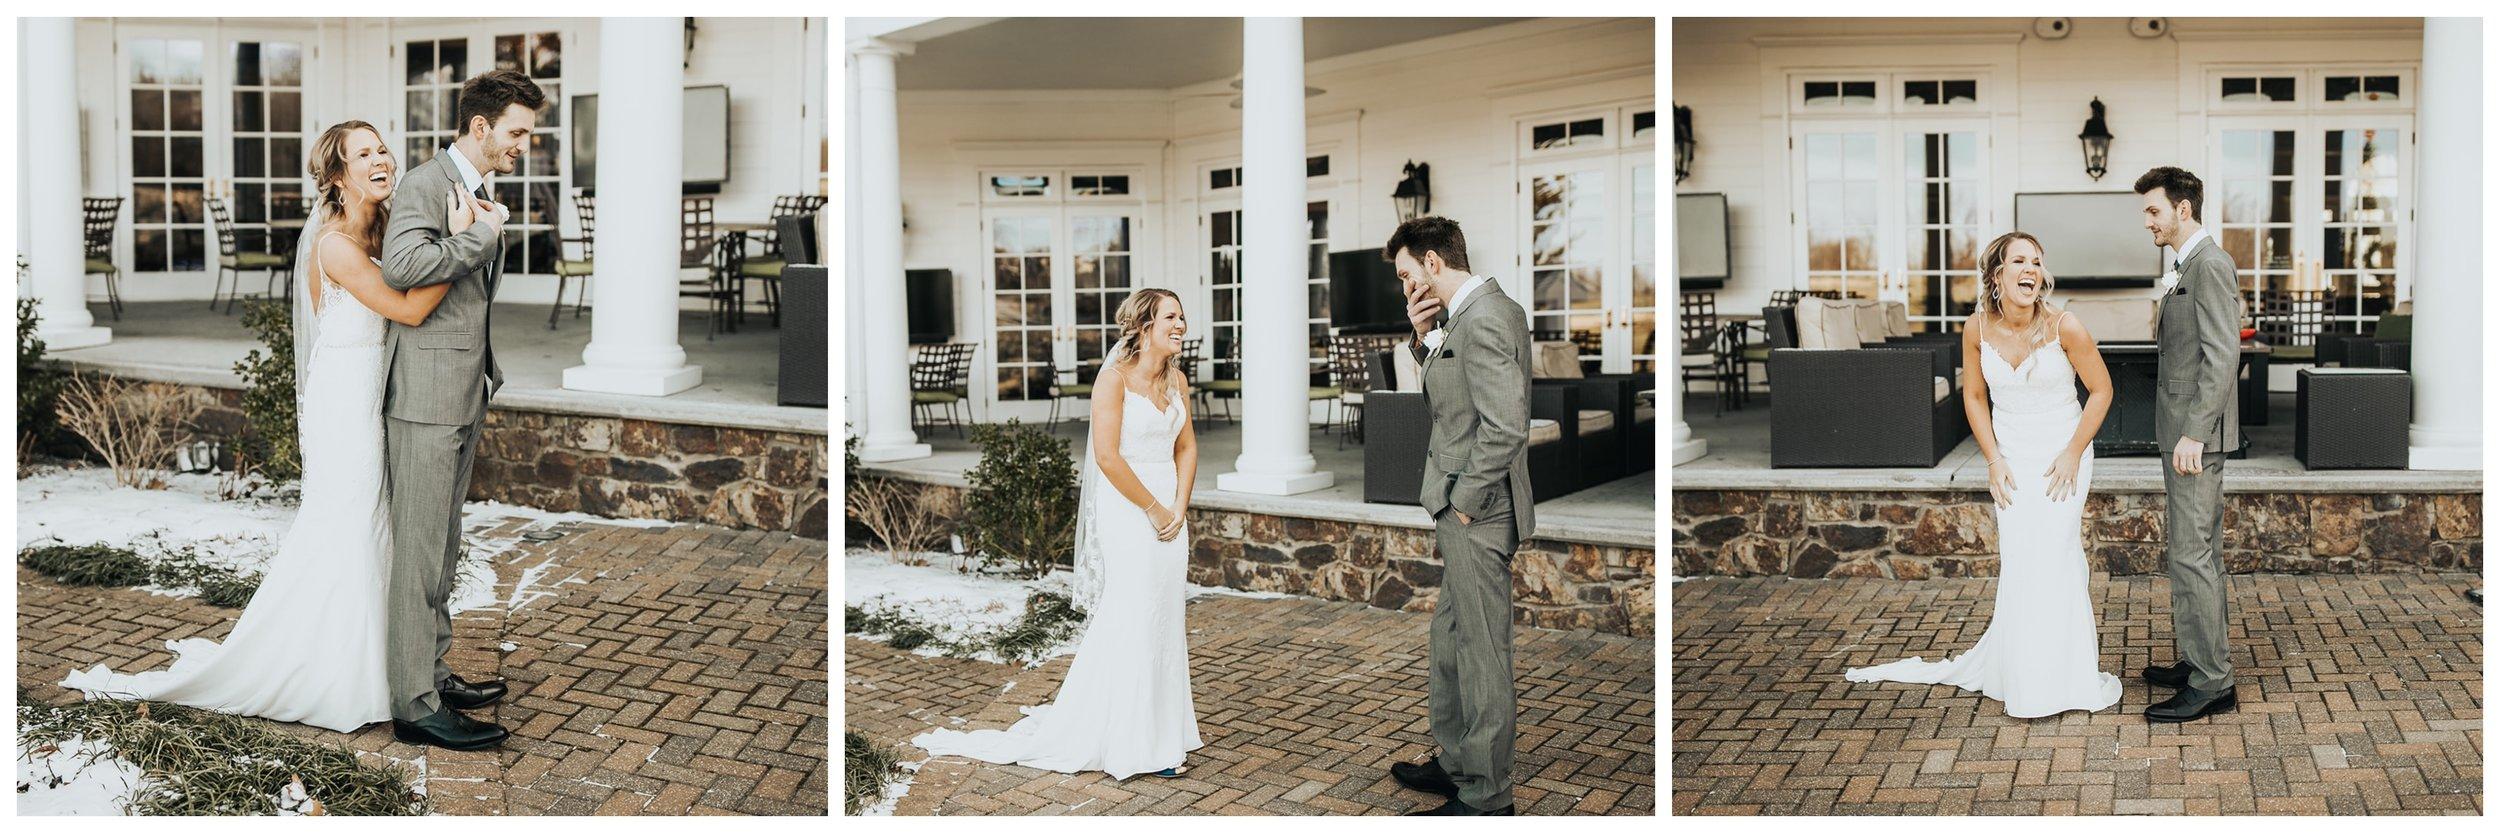 Kansas City Wedding Gown Boutique